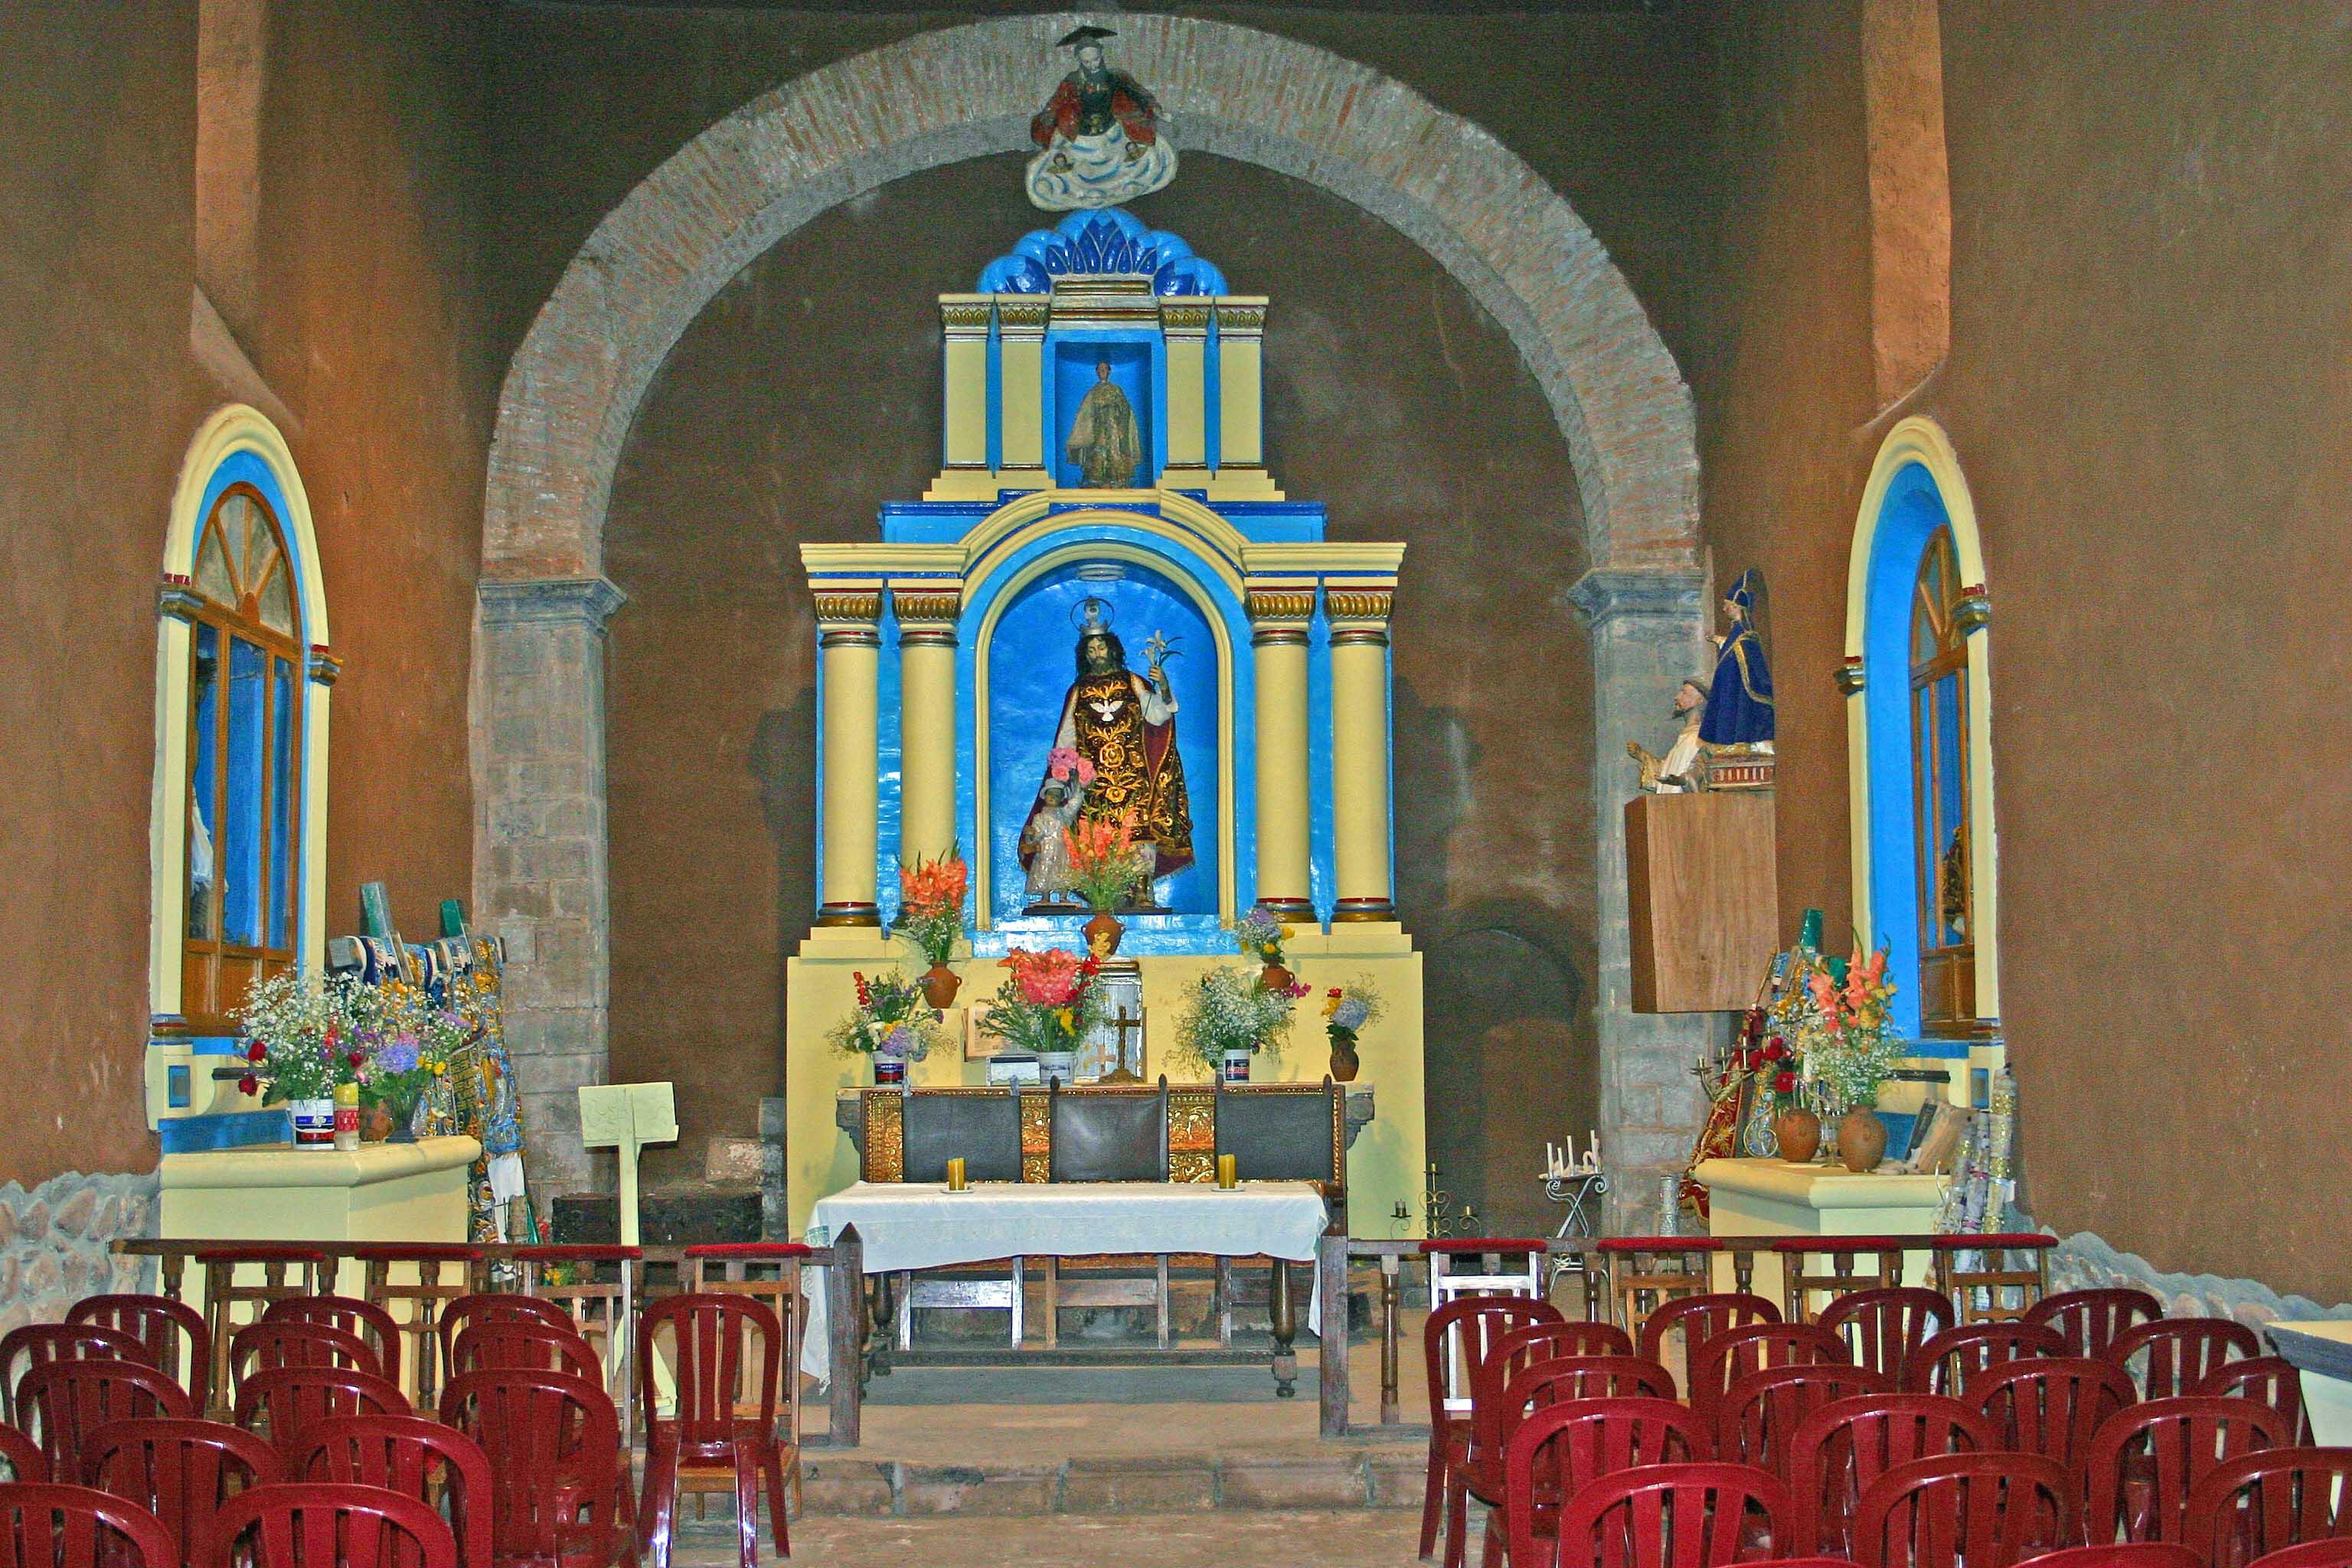 Peru The_old_church_at_the_San_Agustin_Monasterio_in_Urubamba_Peru_copy